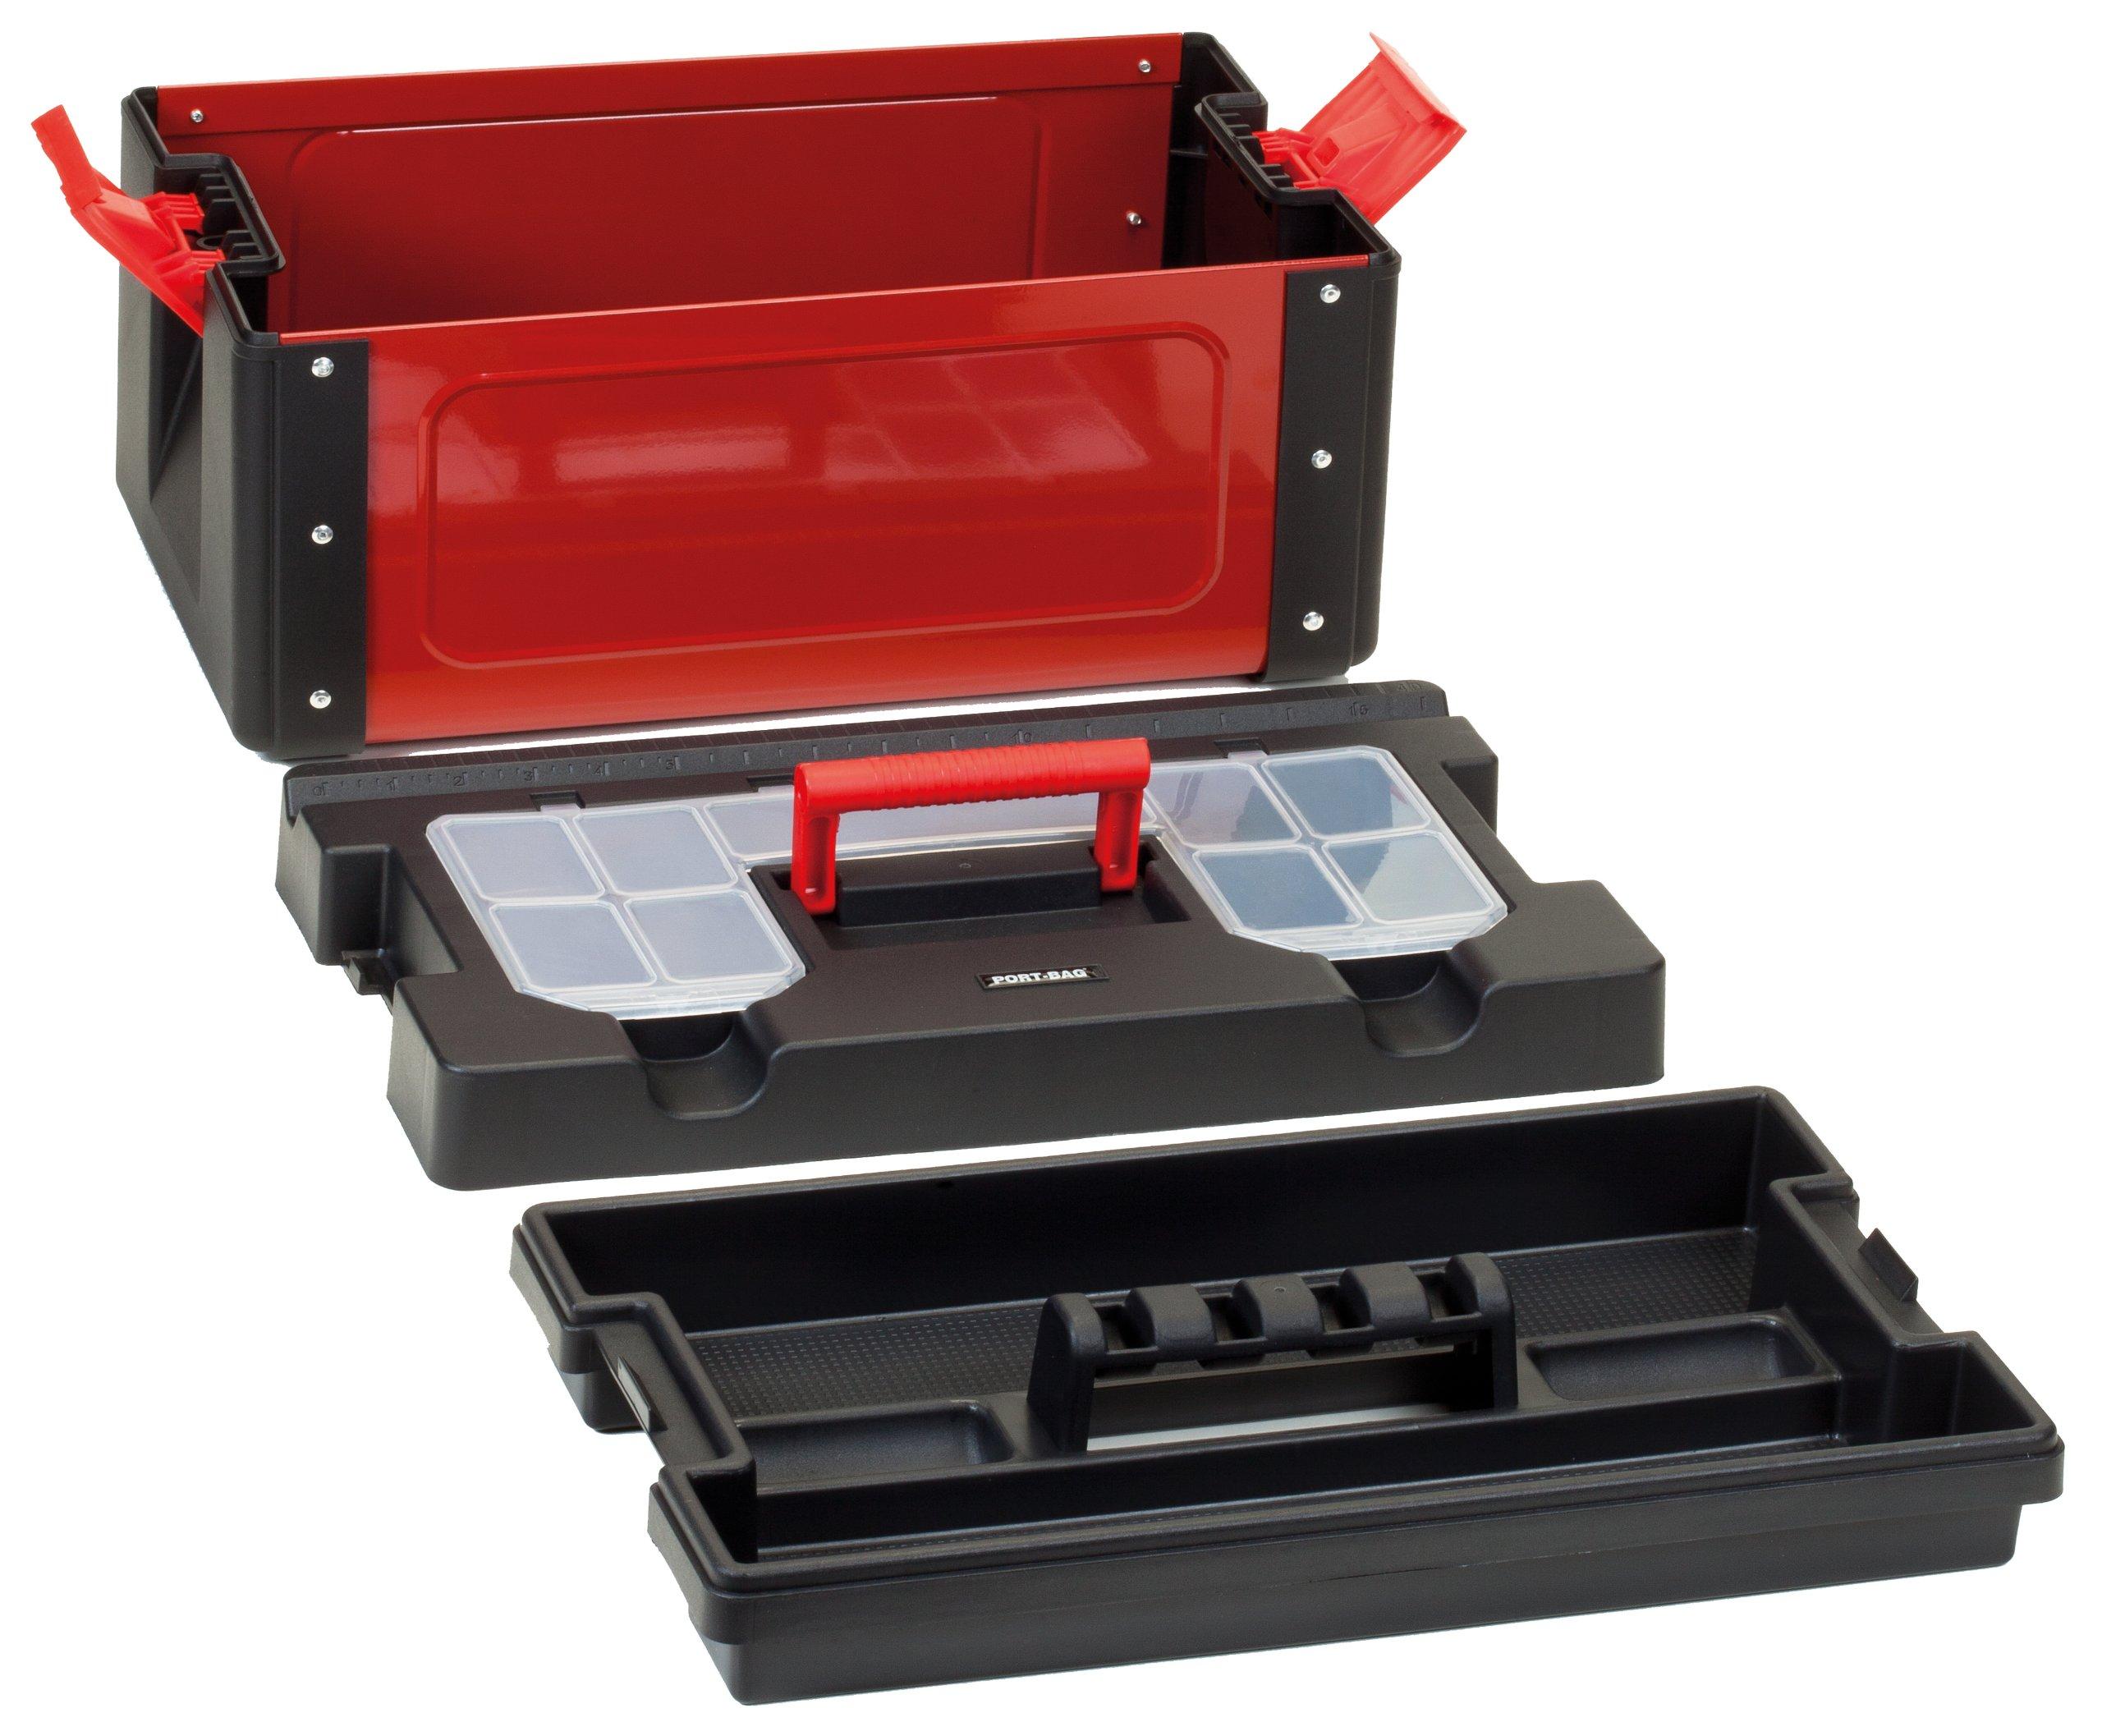 Viso STEELBOX22 Steel/ Polypropylene Tool Box by Viso